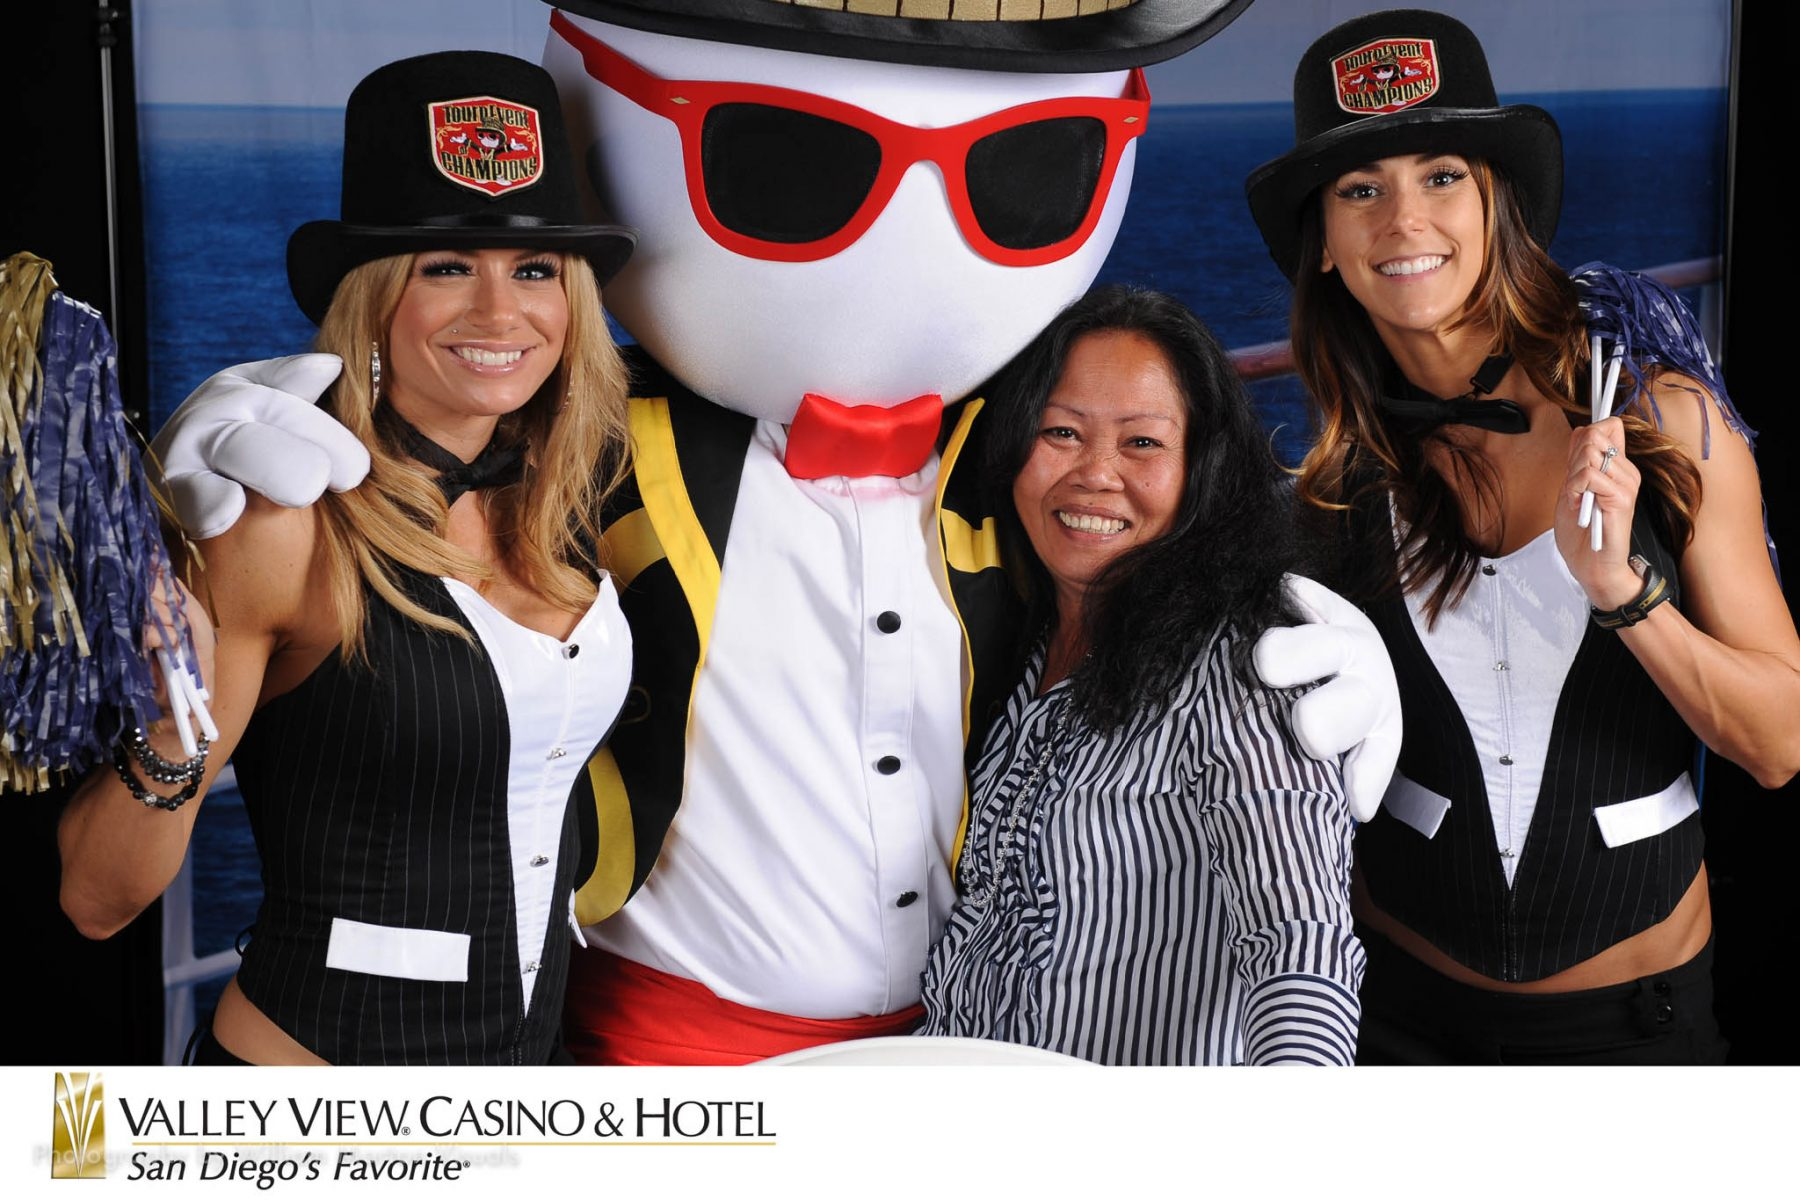 Casino event portraits printed on-site